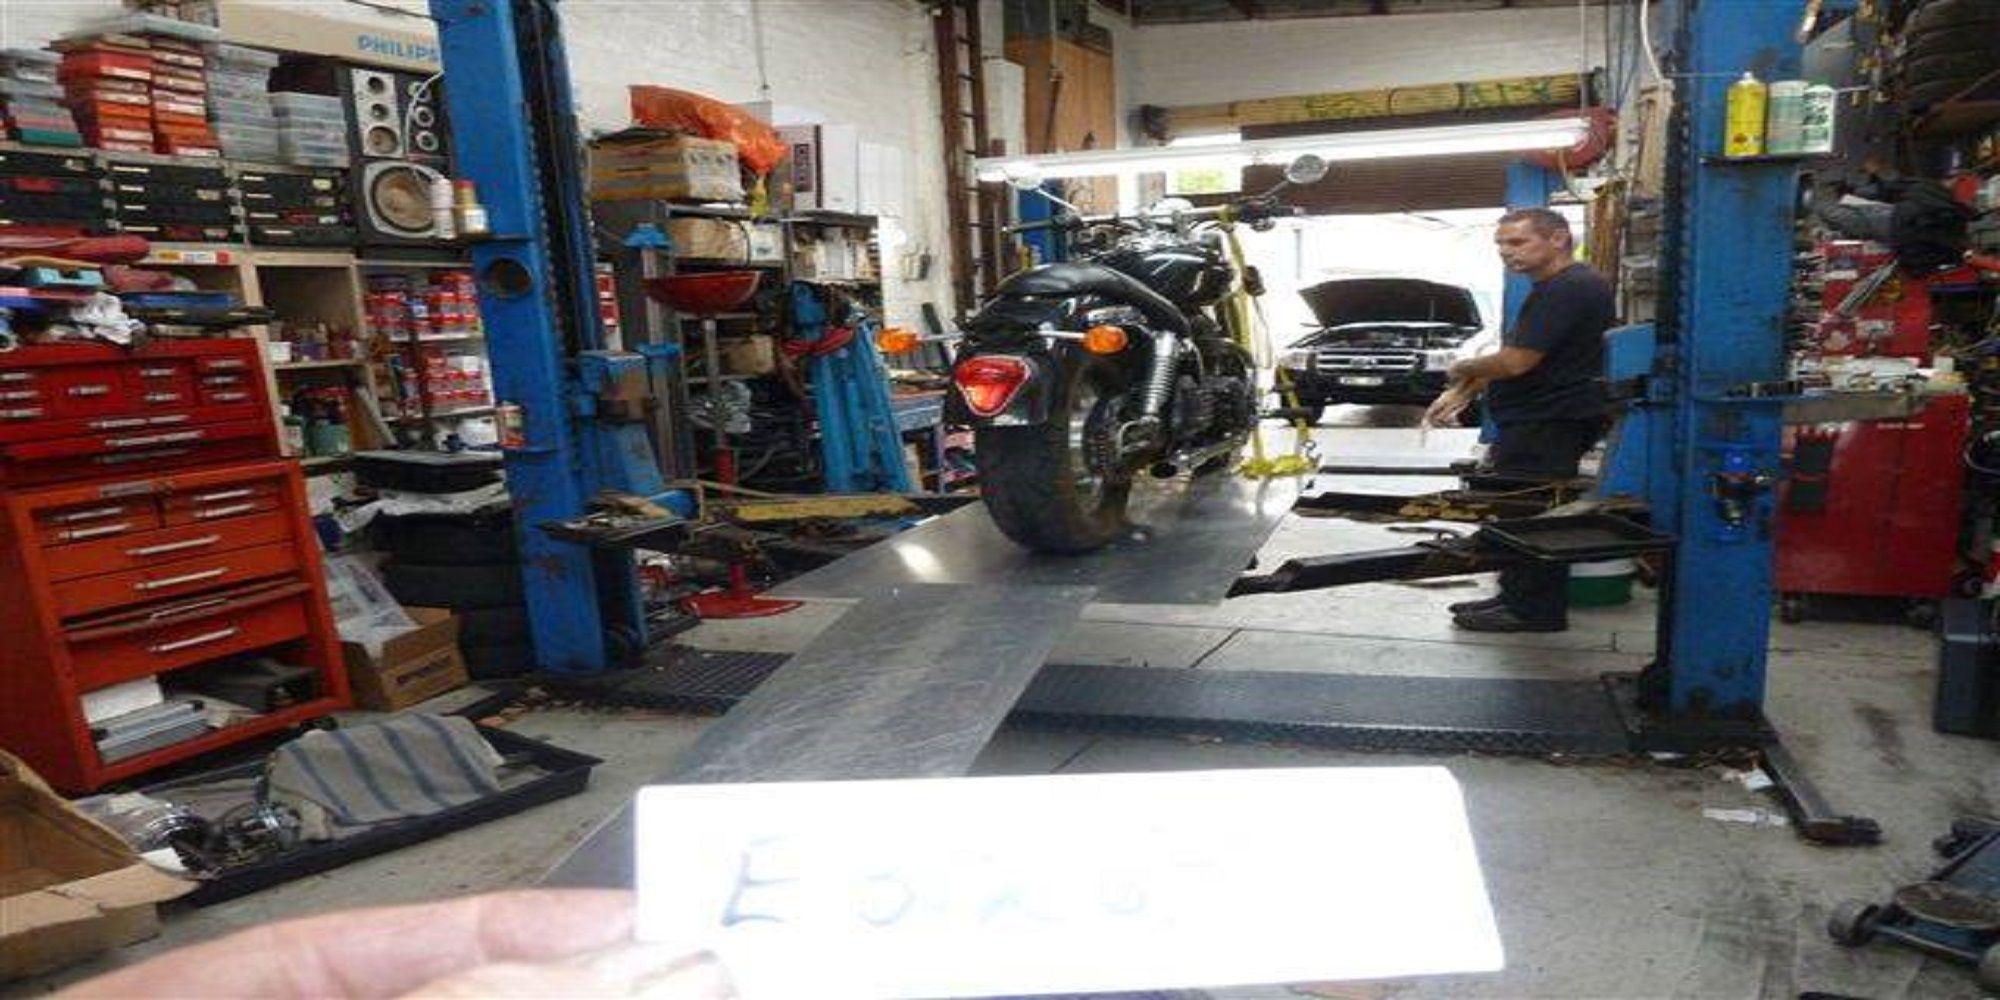 Services AAA Automotive Provide • Car Service • Clutch